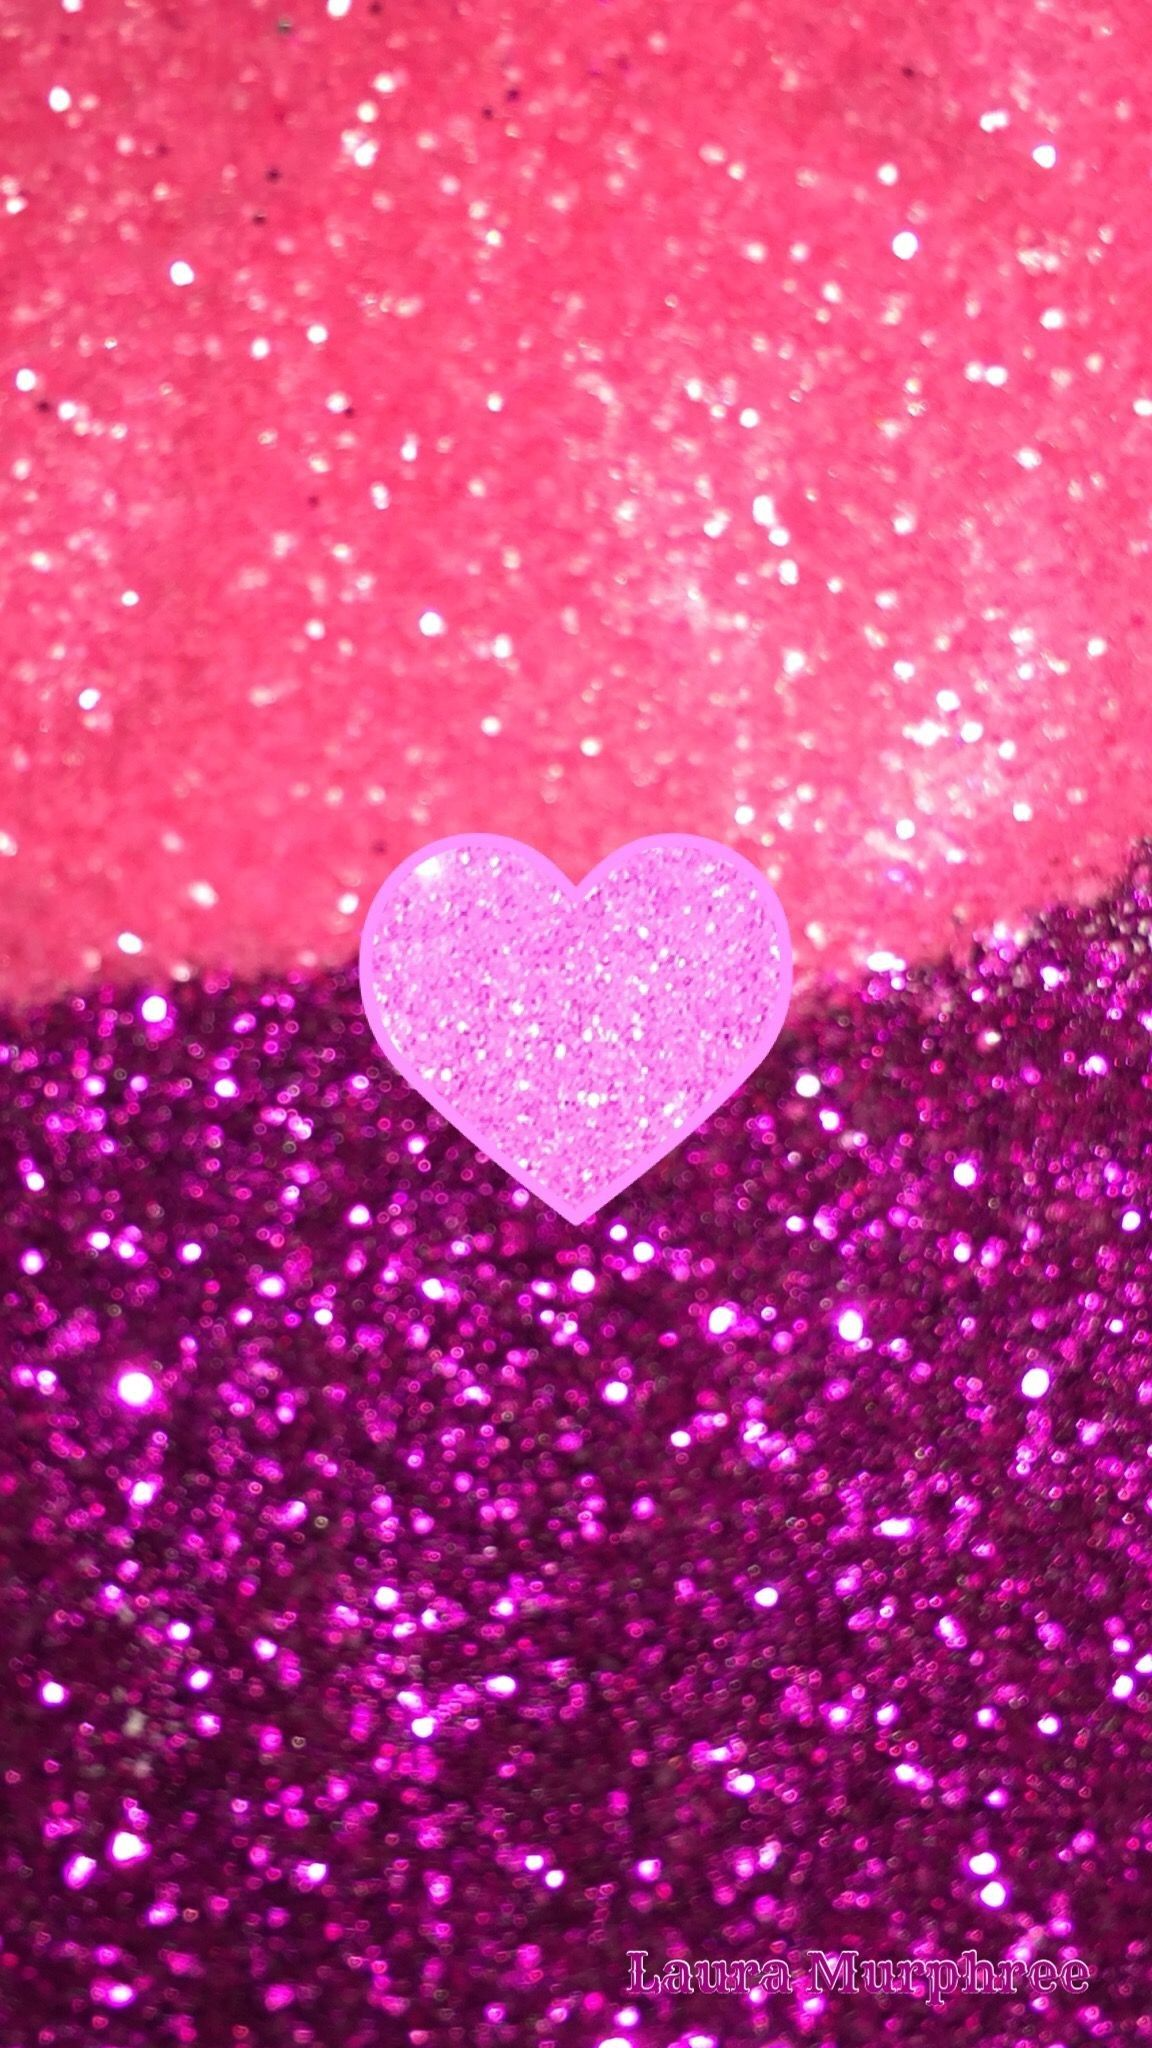 Cute Glitter Iphone Wallpapers Top Free Cute Glitter Iphone Backgrounds Wallpaperaccess